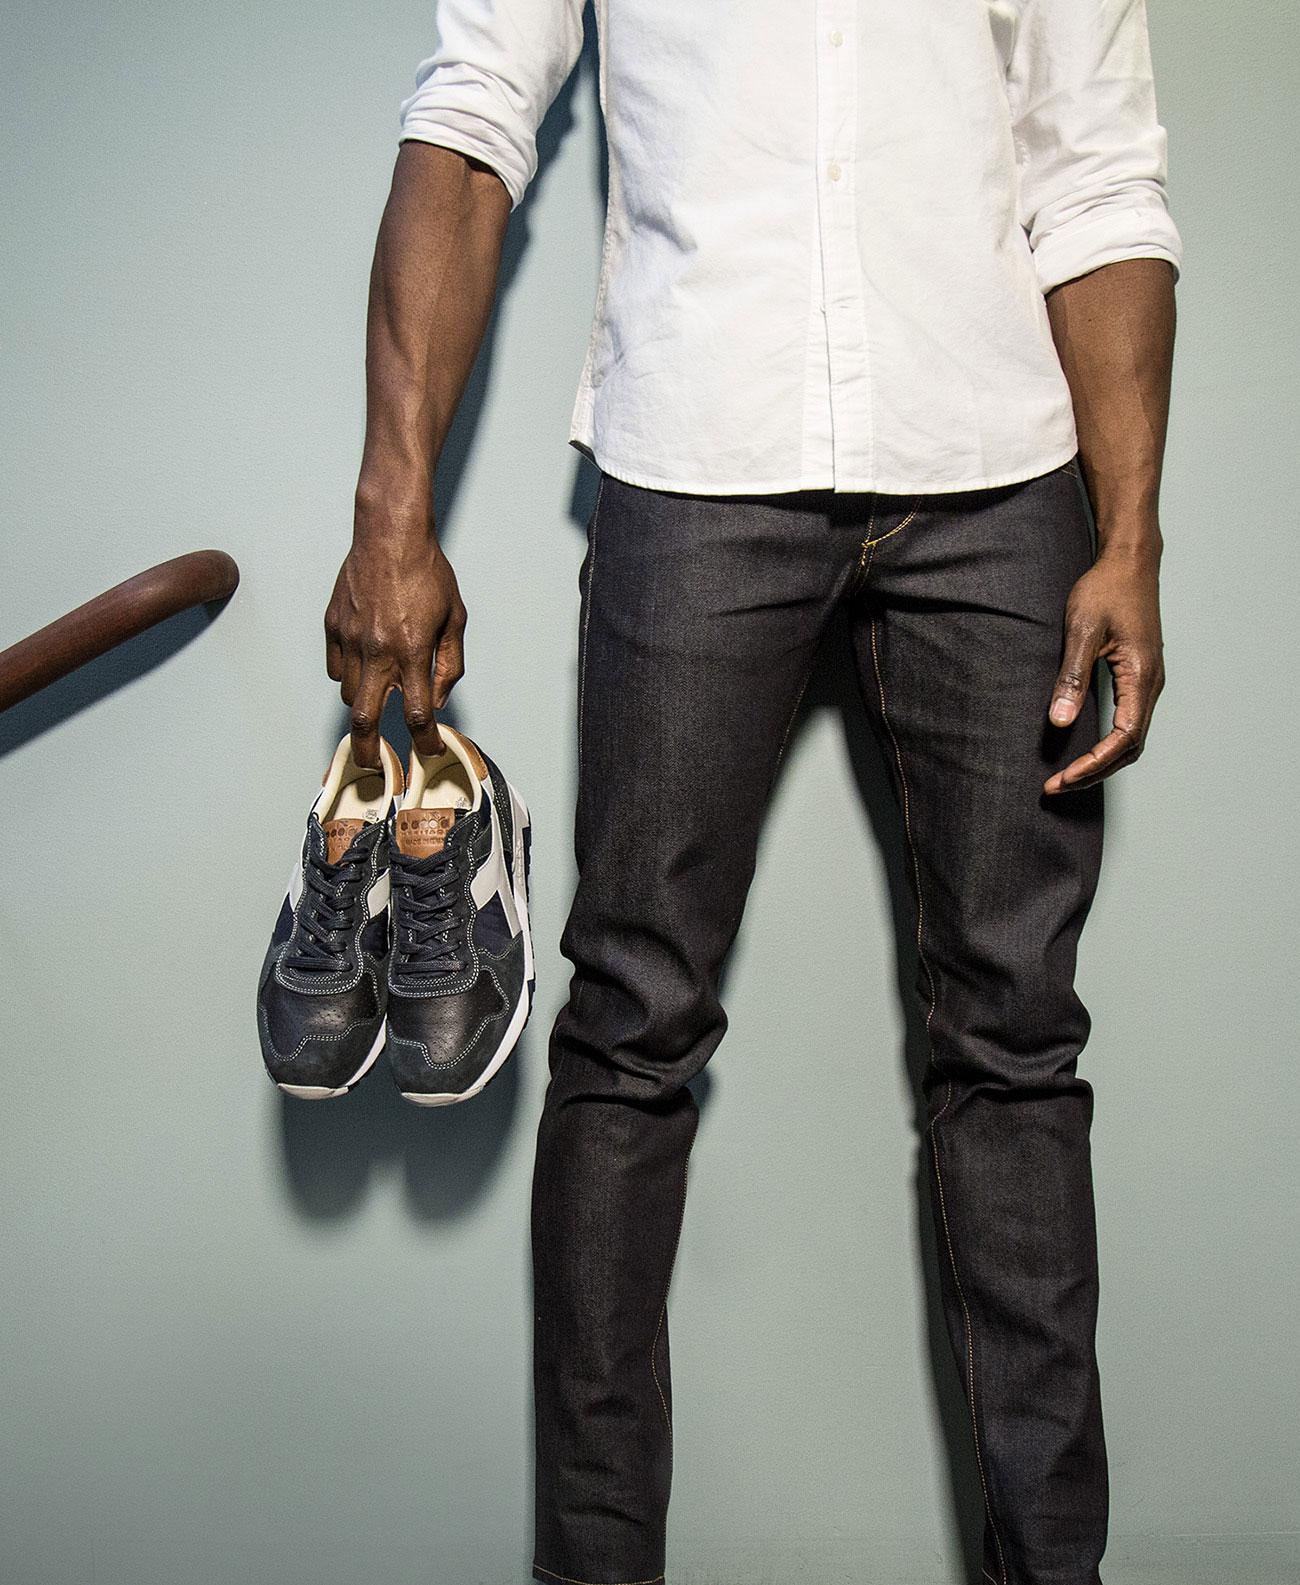 Sunday 14:00 - Brunch + Sneakers